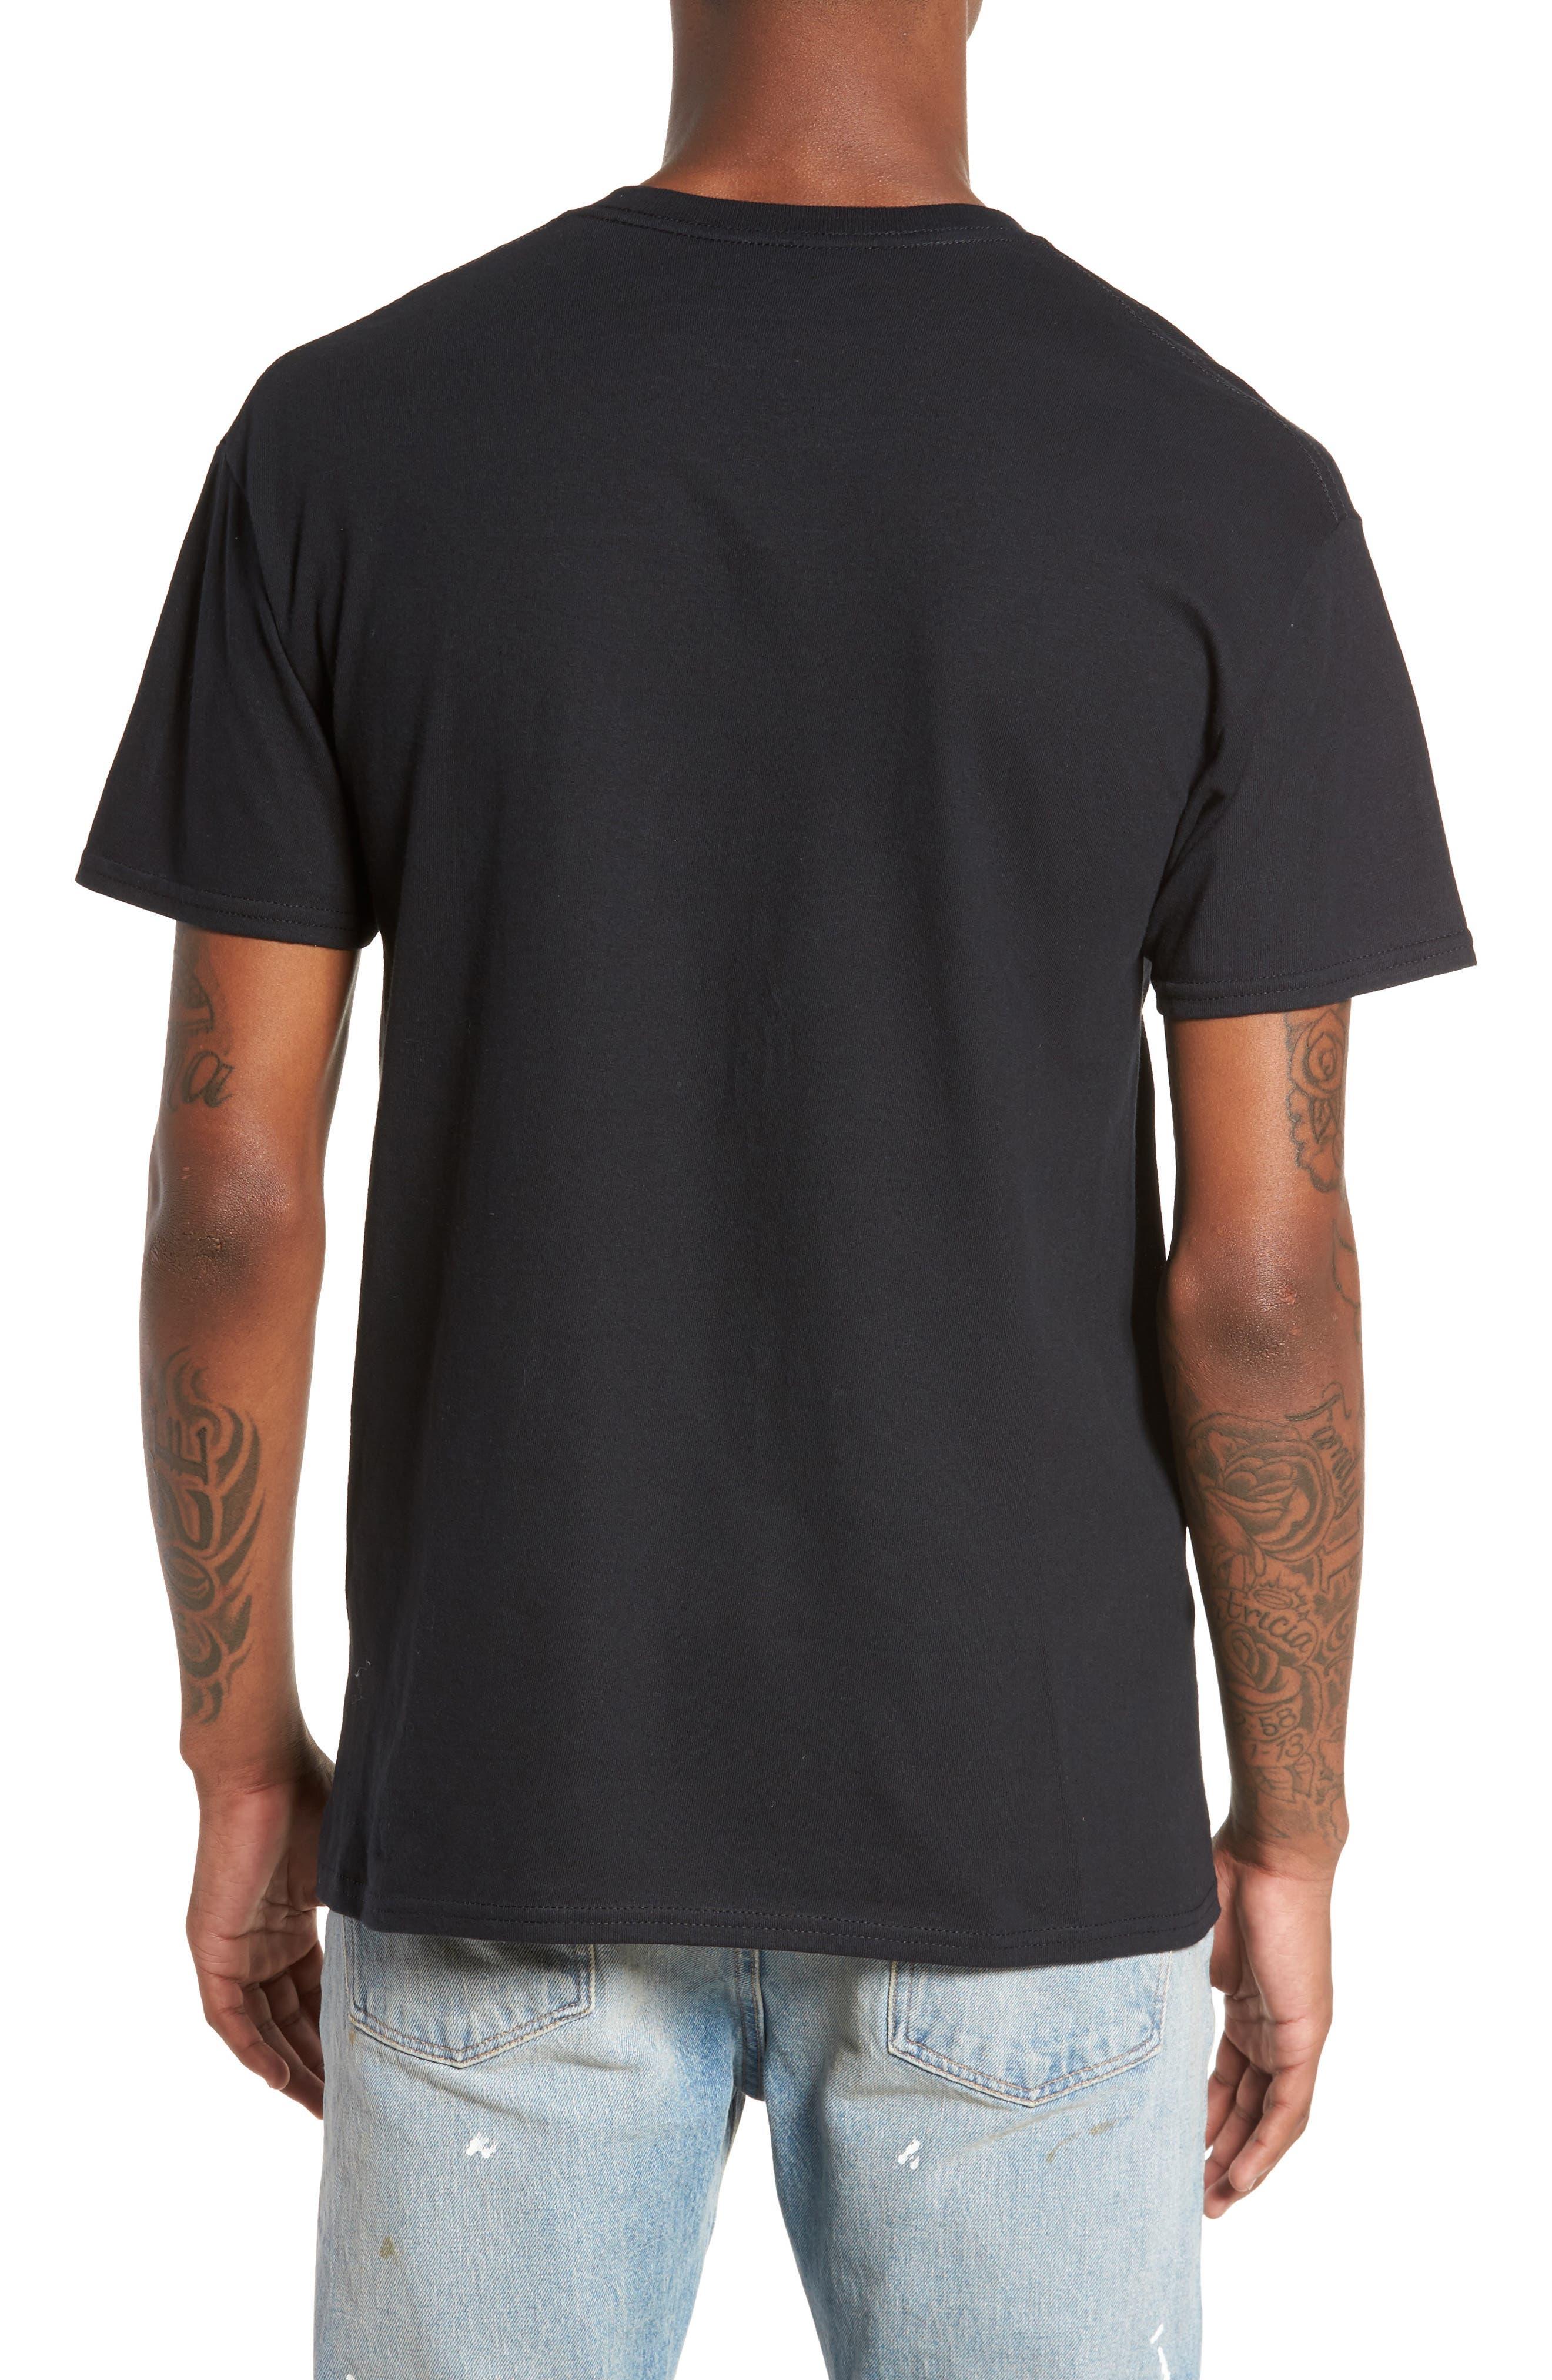 Ice Cube T-Shirt,                             Alternate thumbnail 2, color,                             Black Tee Ice Cube Face